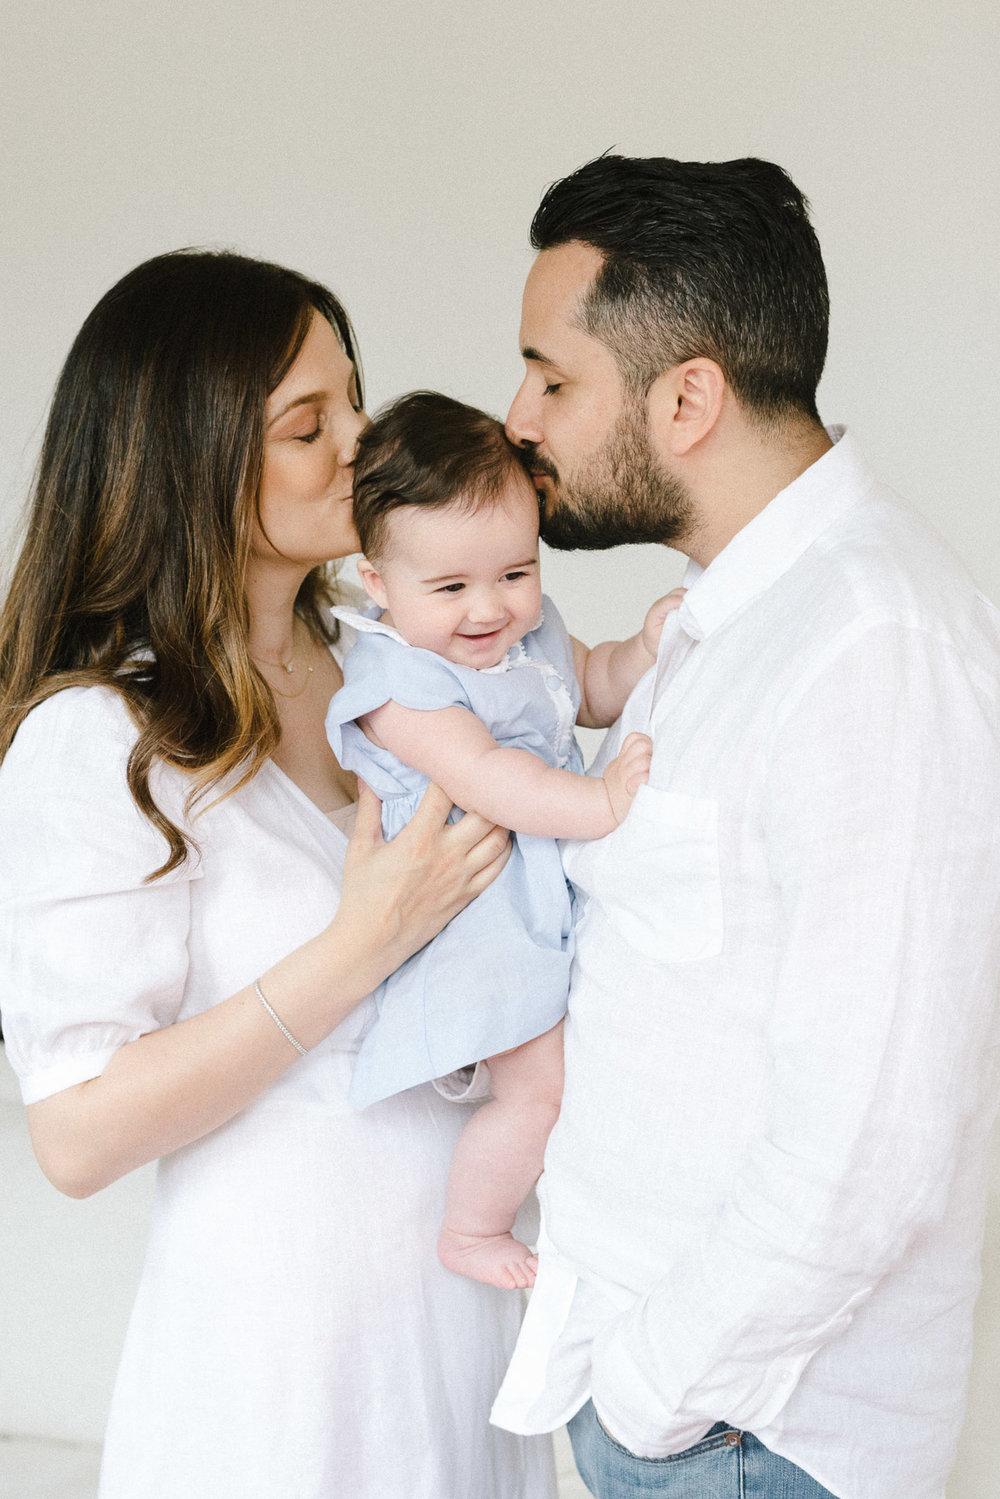 New York City Family and Newborn Photographer